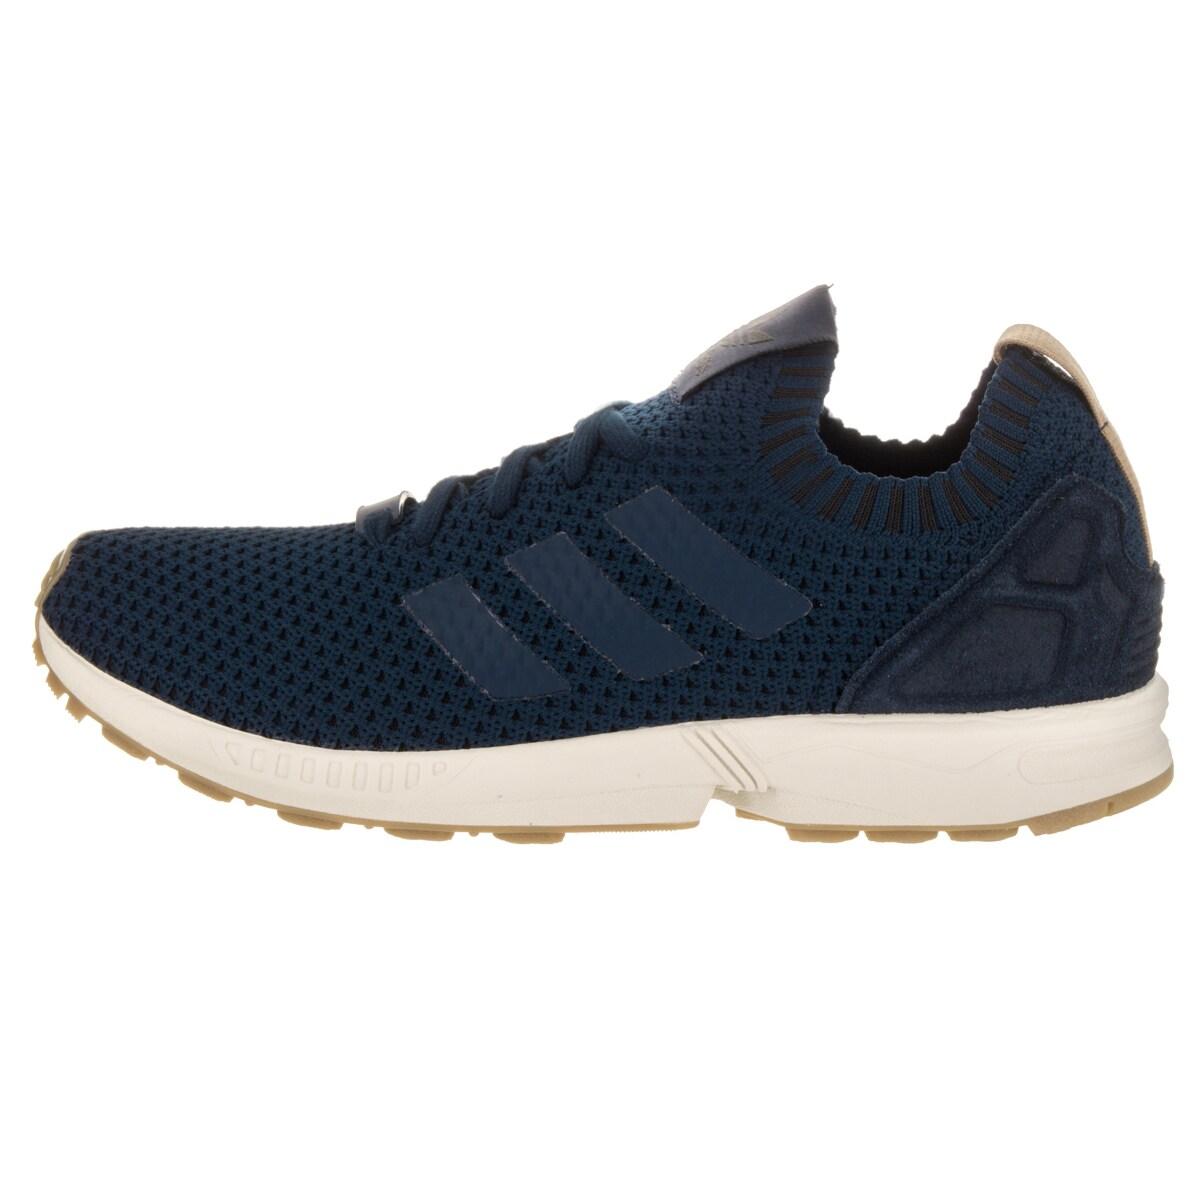 Adidas Men's Zx Flux Pk Originals Casual Shoe